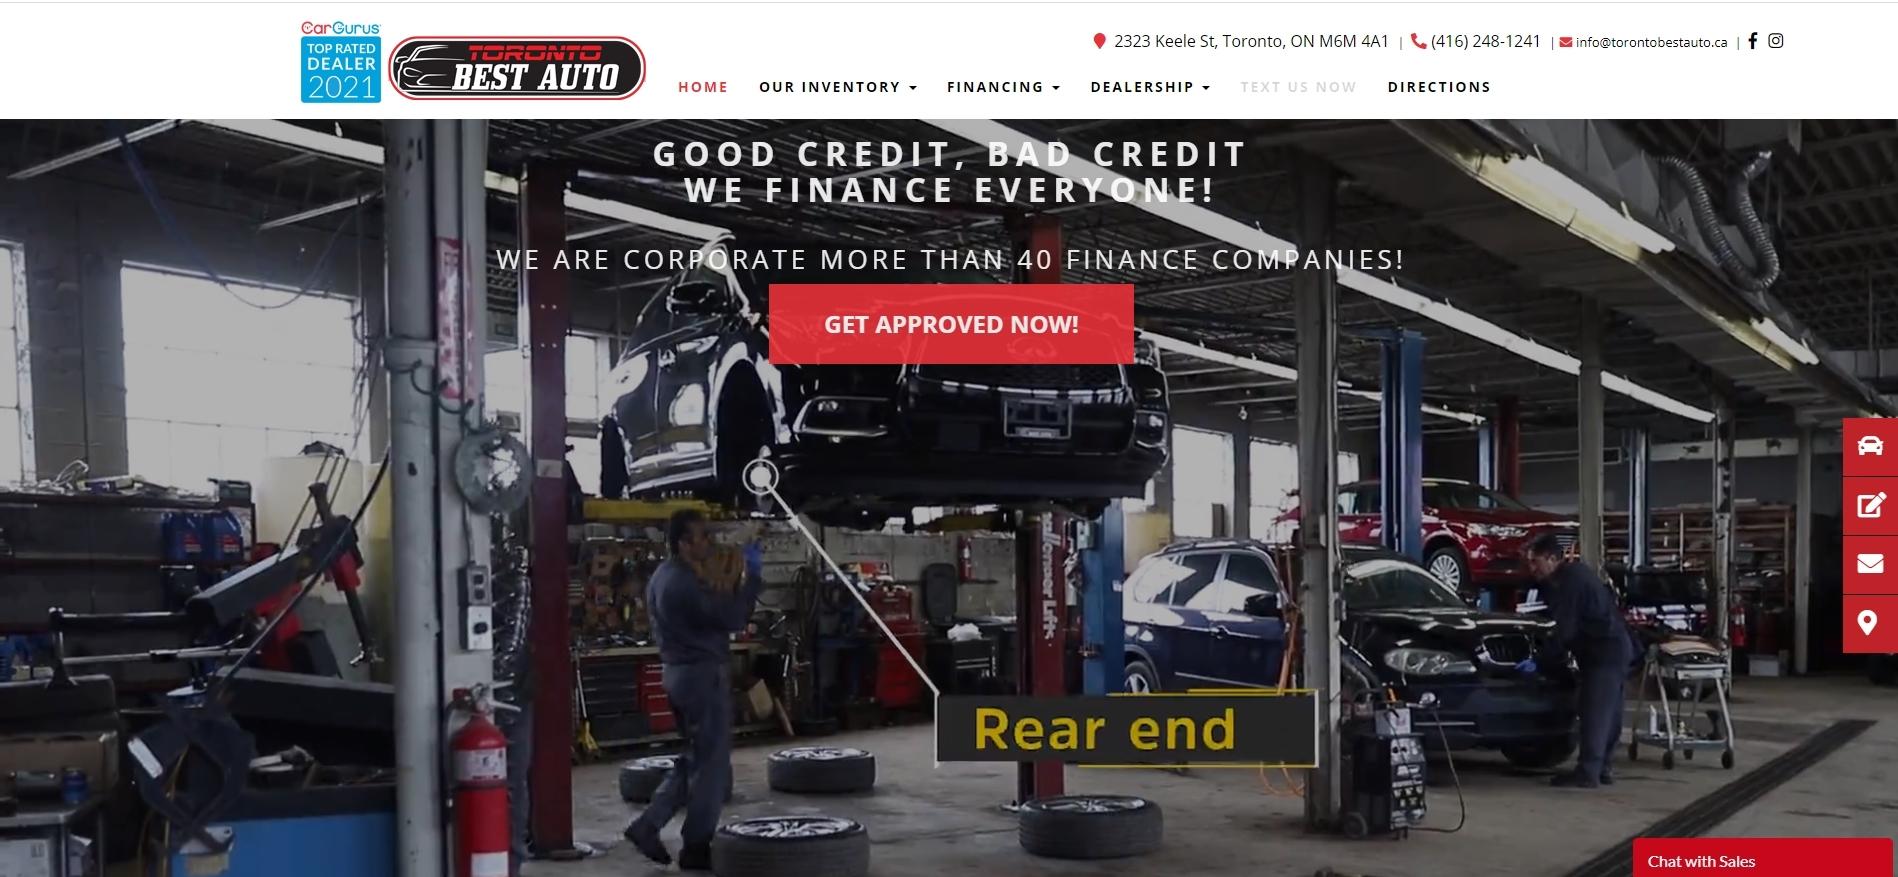 Toronto Best Auto -used car dealerships